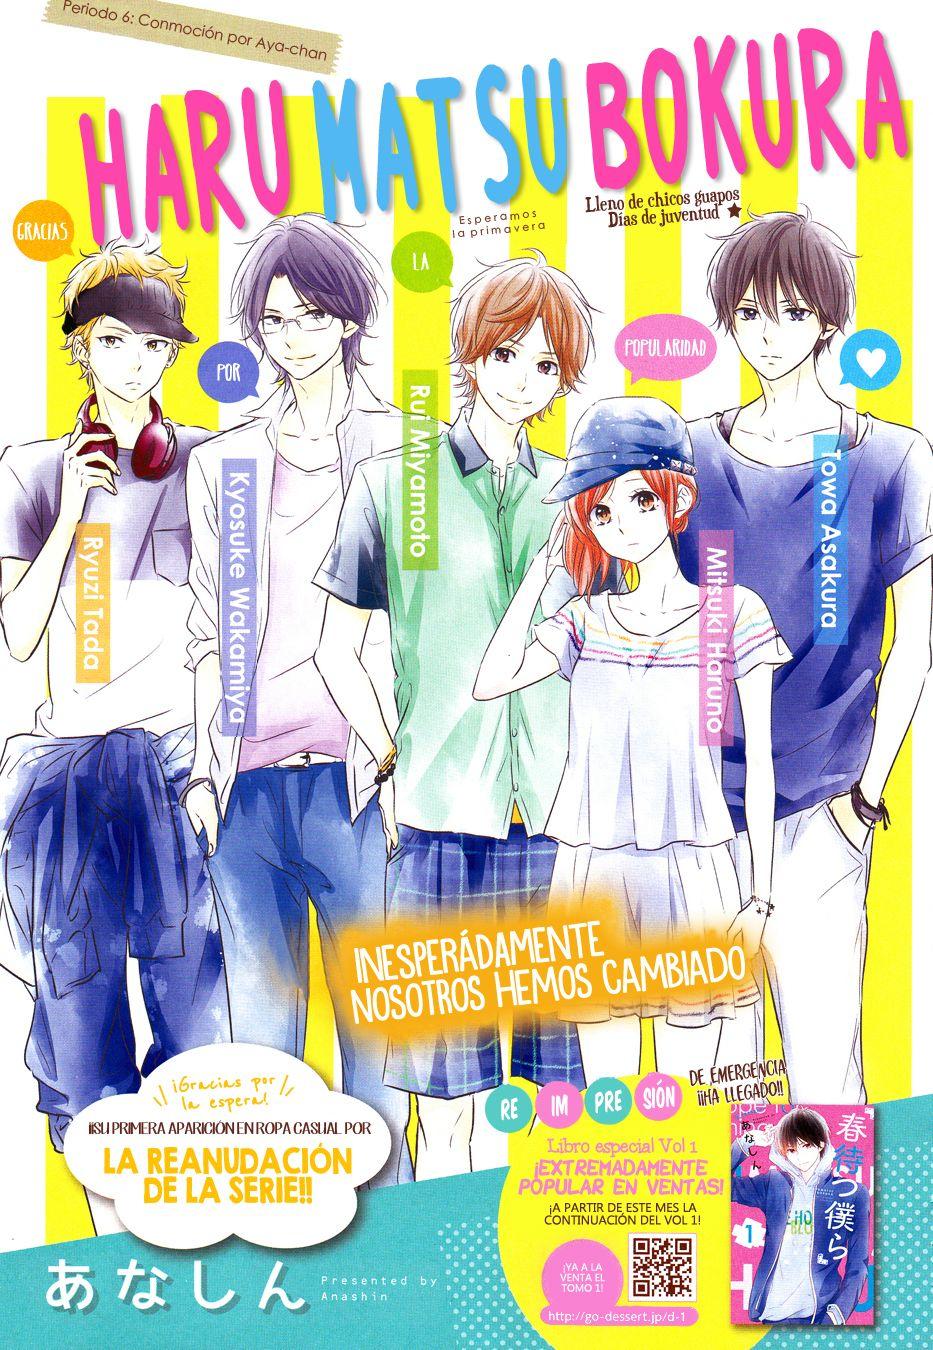 Haru Matsu Bokura - MANGA - Lector - TuMangaOnline | kuk | Pinterest ...